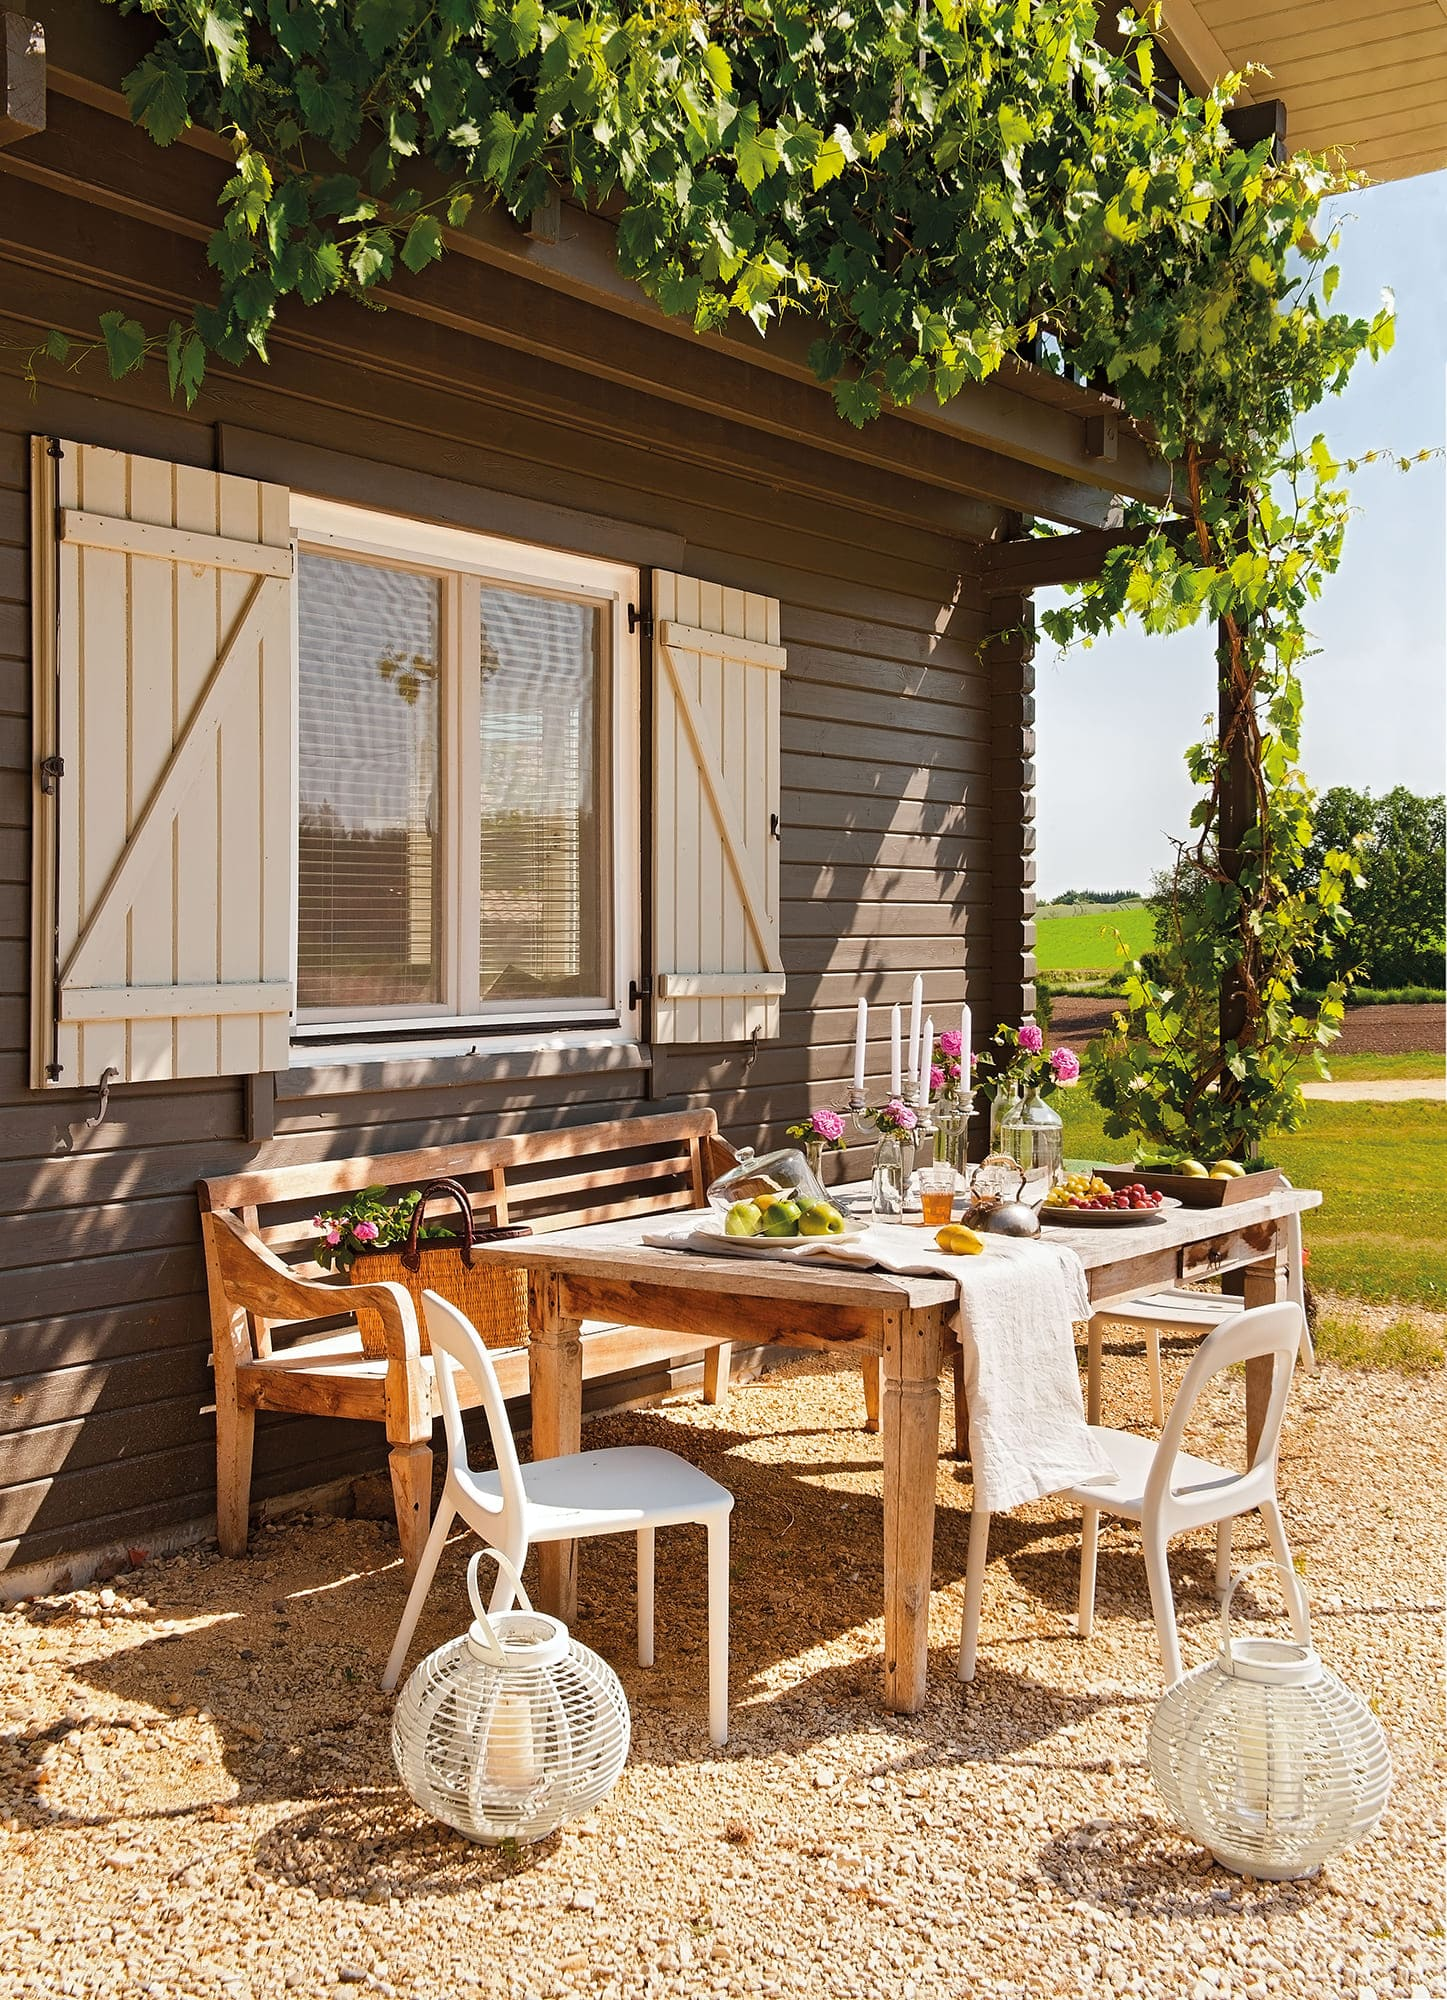 exterior de casa rustica con zona de comer